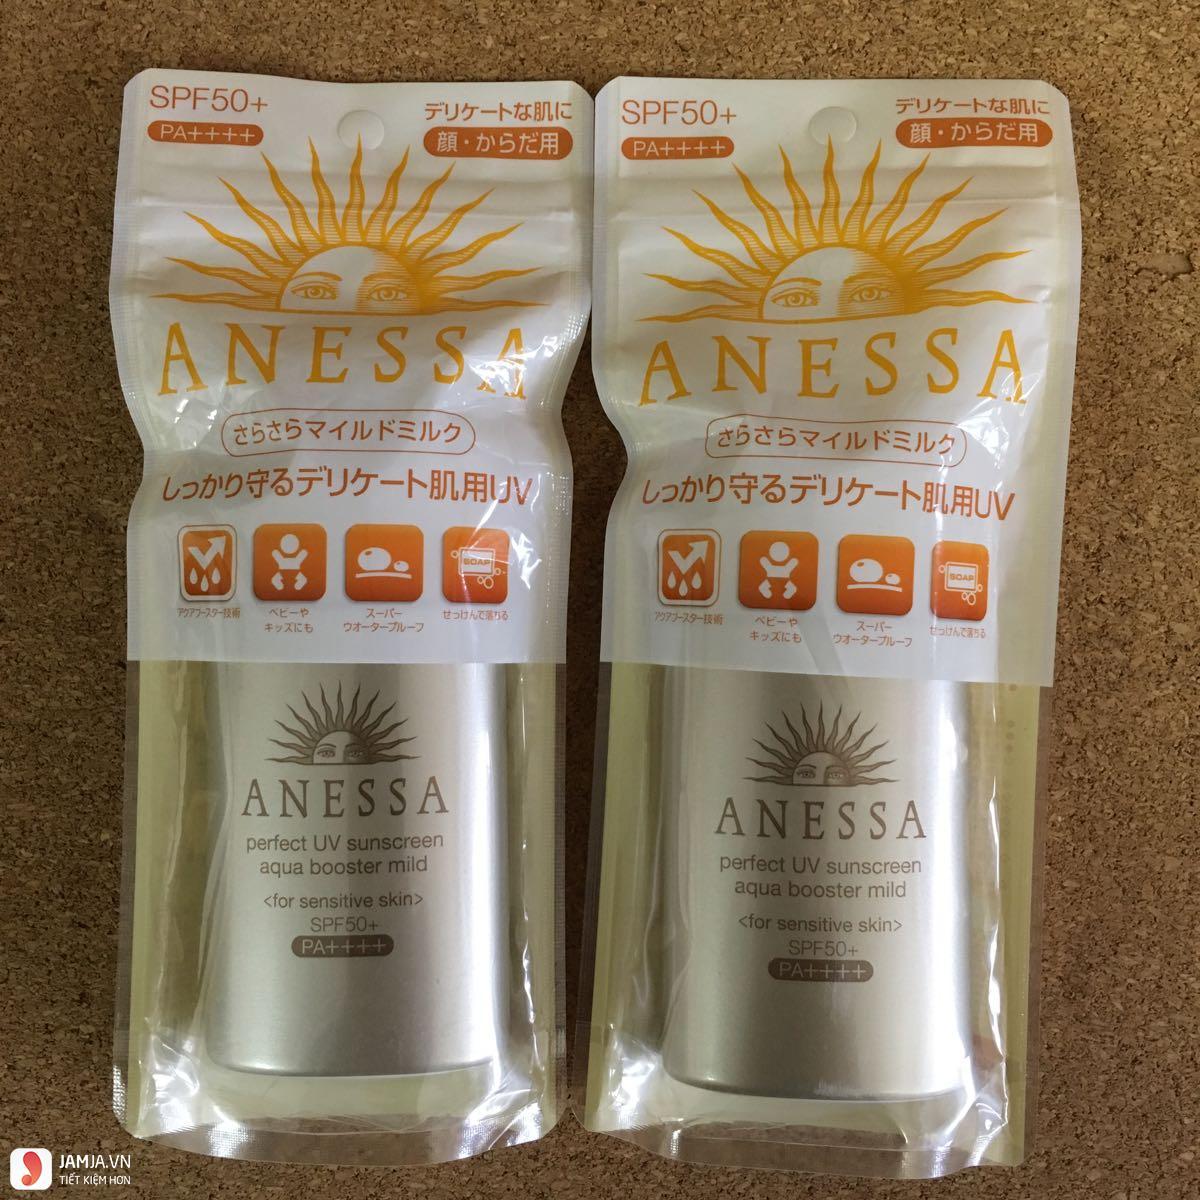 Anessa Pefect UV Sunscreen Aqua Booster Mild SPF50+/PA++++